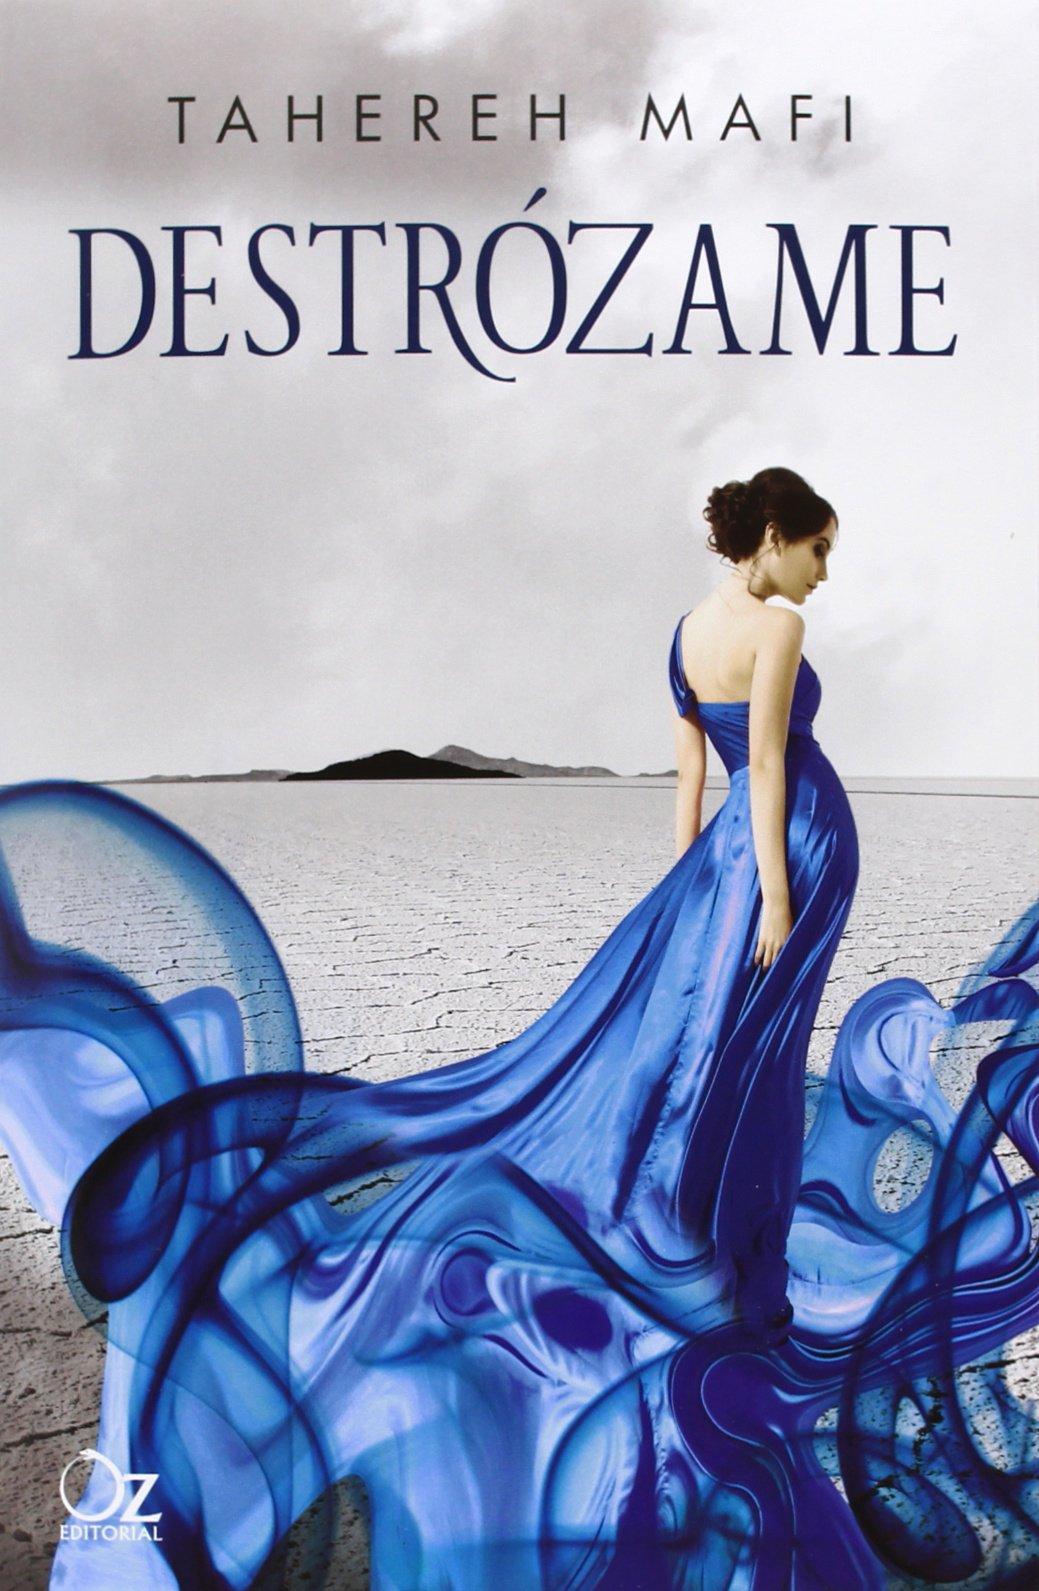 Destrózame (Oz Editorial): Amazon.es: Tahereh Mafi, Andrea Romero ...